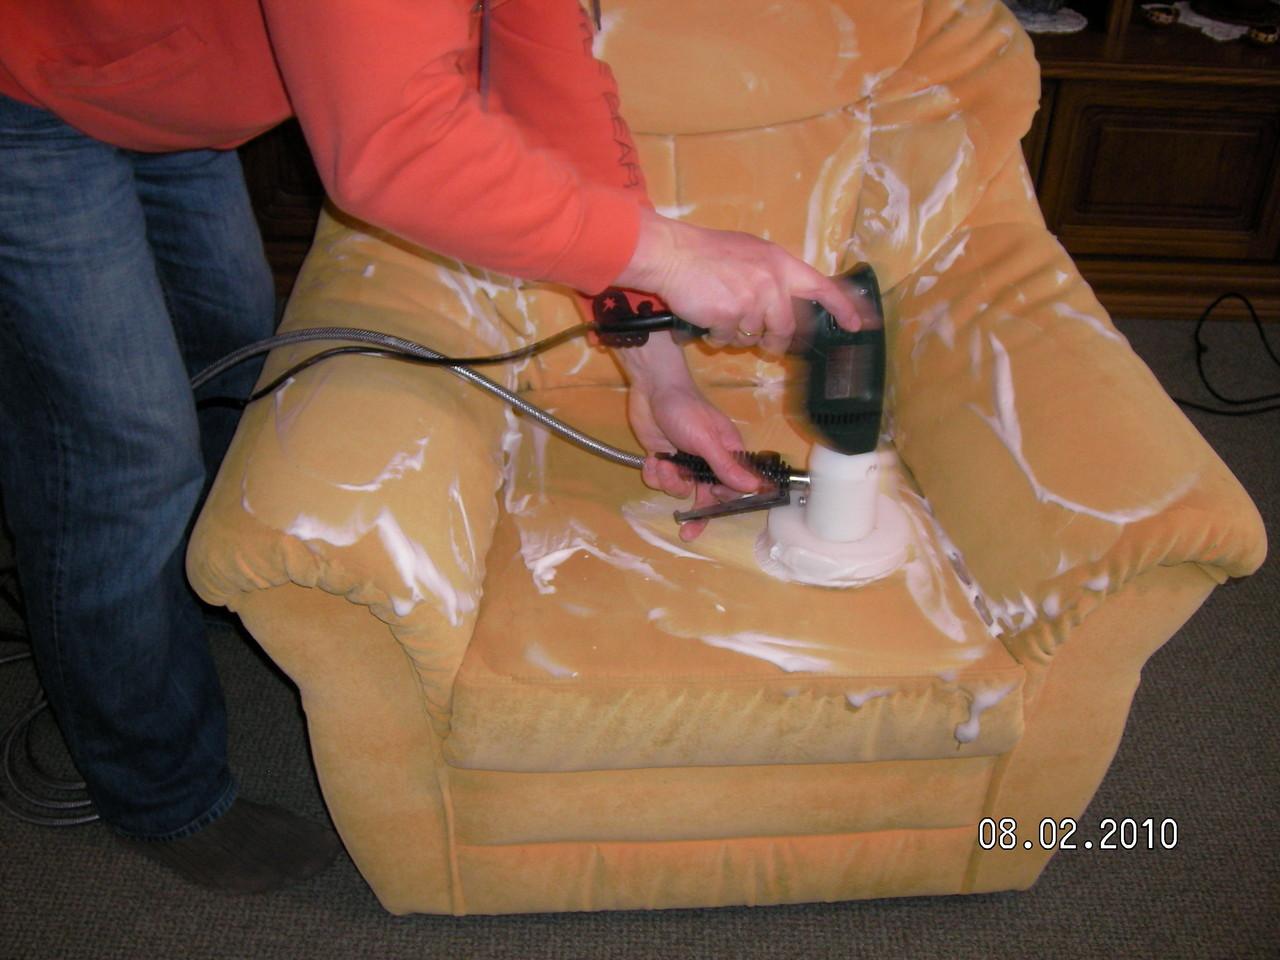 polsterm bel autositze ect wir reinigen zu fairen. Black Bedroom Furniture Sets. Home Design Ideas